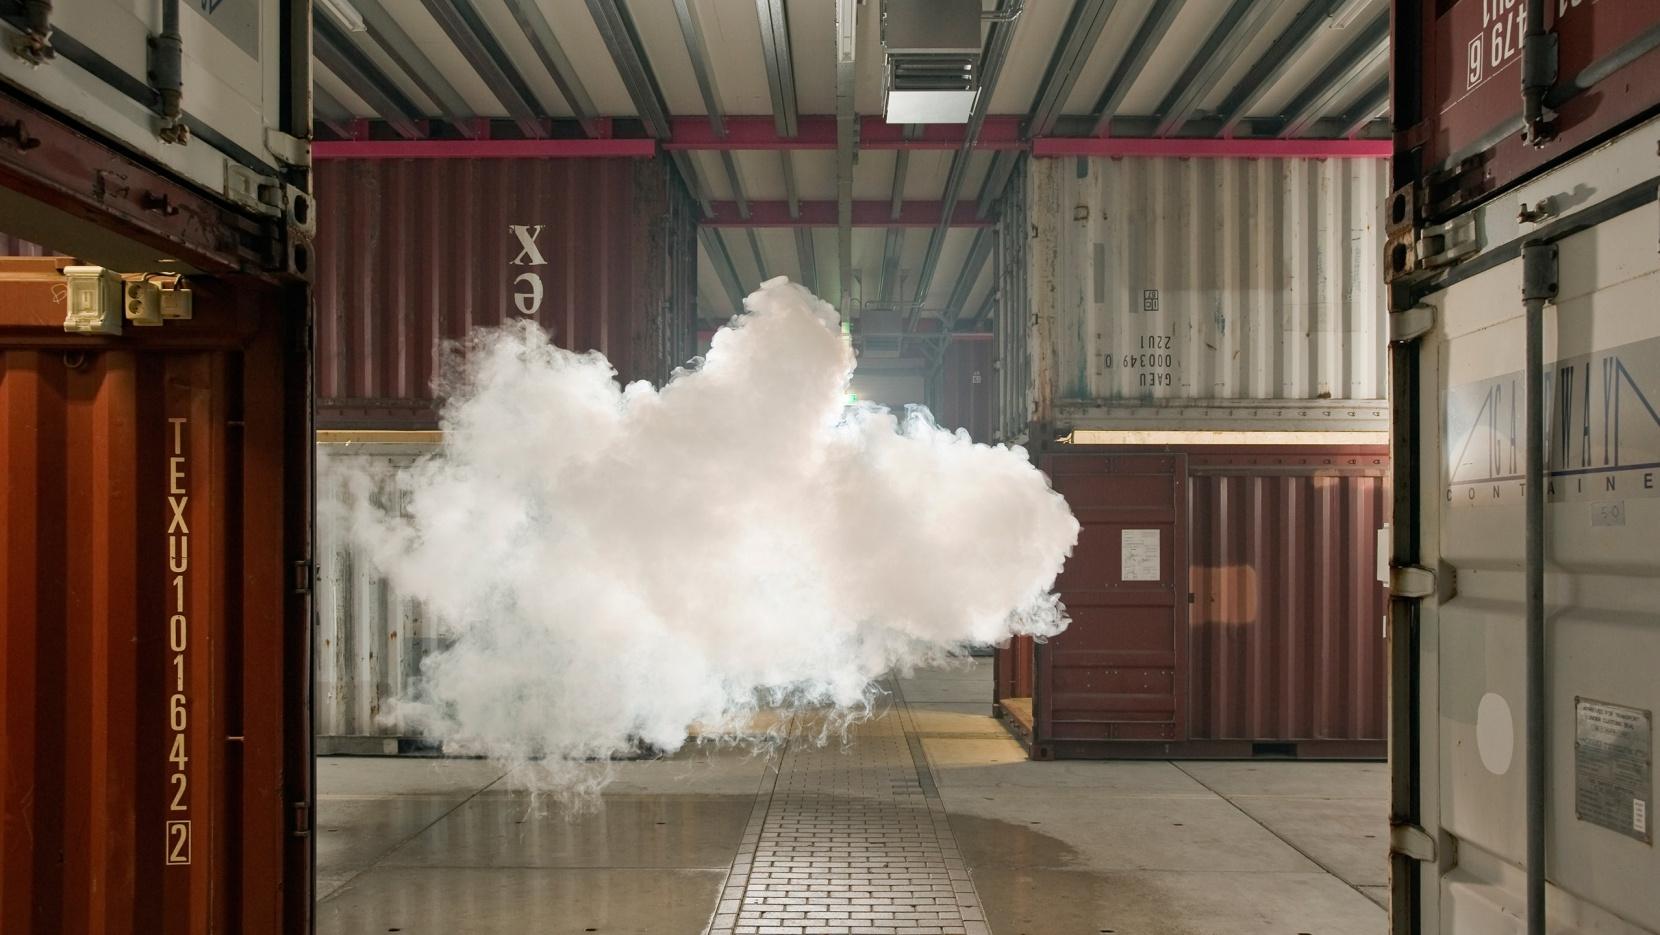 How To Make Clouds Indoors Nimbus By Berndnaut Smilde